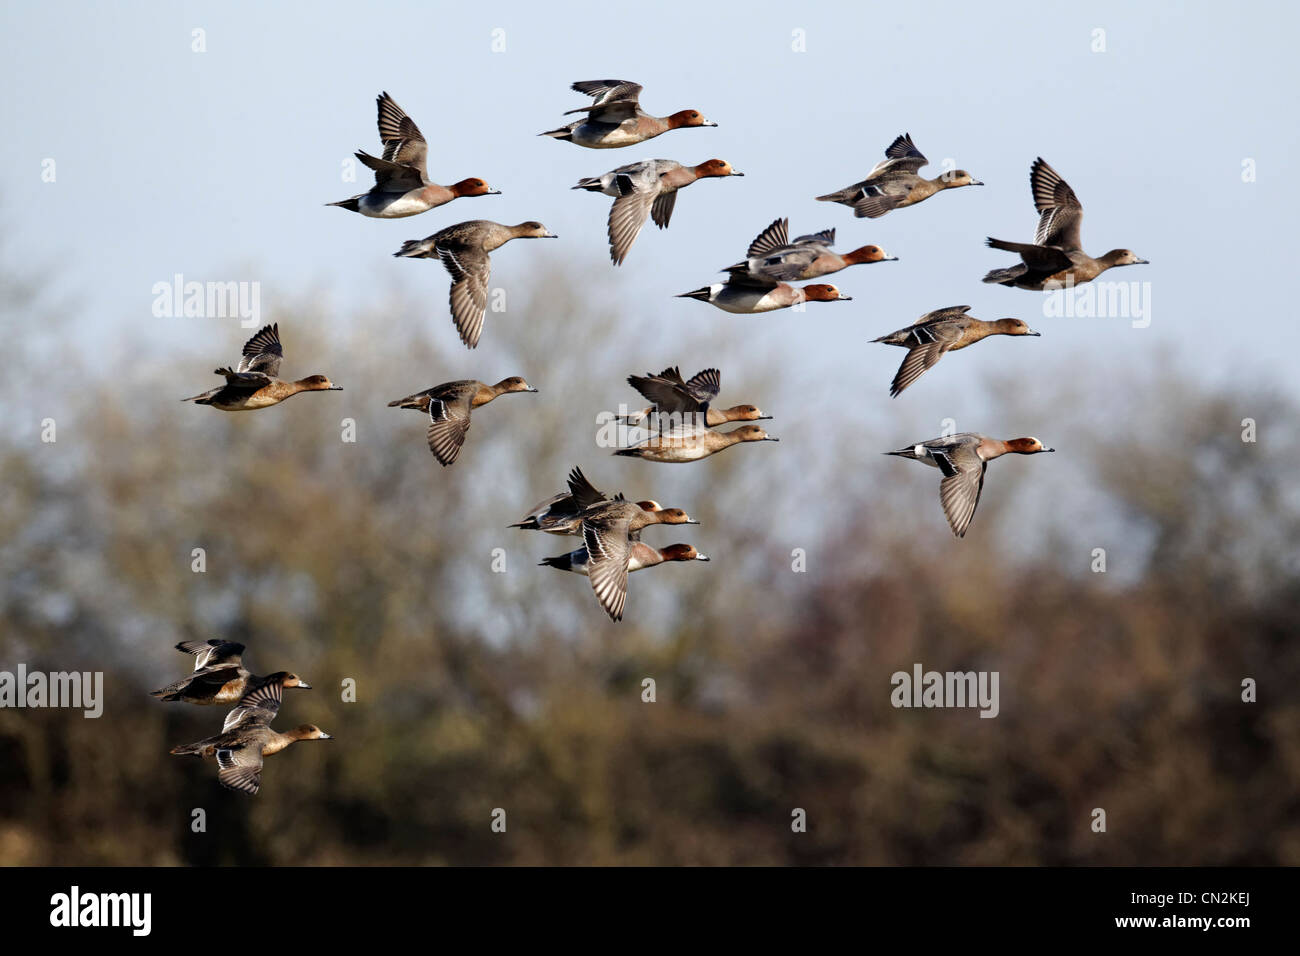 Pfeifente, Anas Penelope, Gruppe der Vögel im Flug, Gloucestershire, März 2012 Stockbild